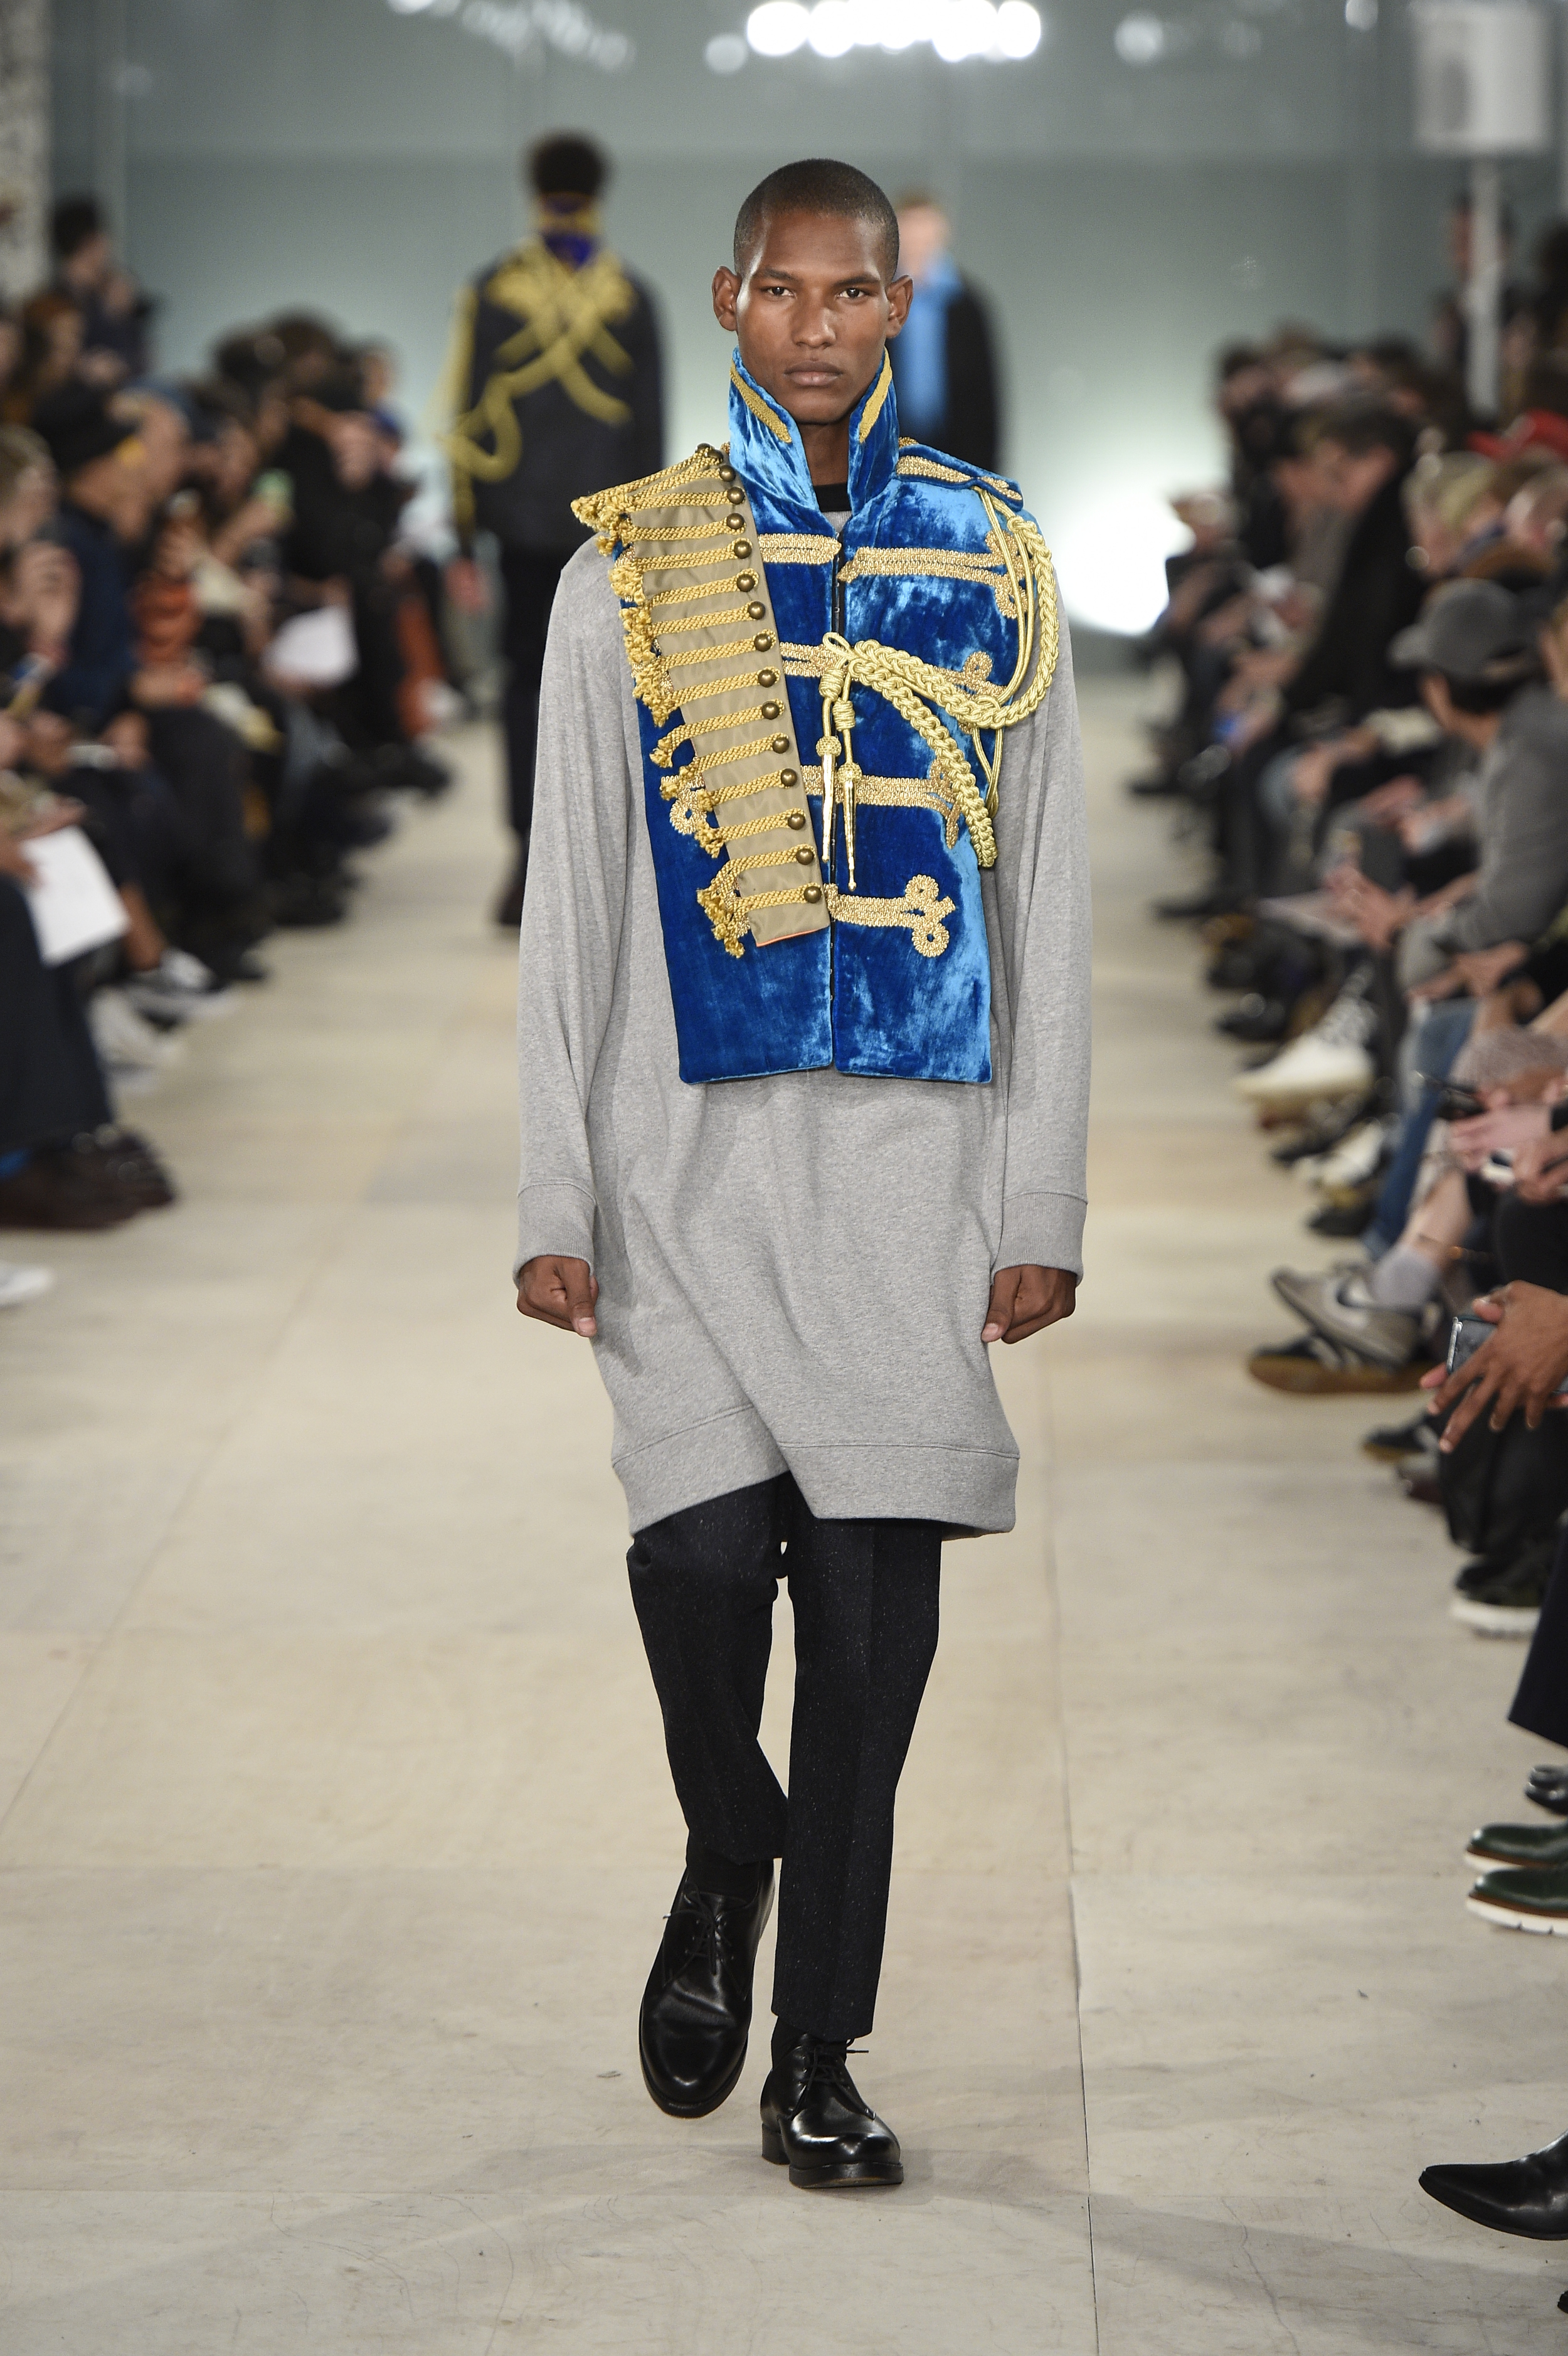 Napoleonic Hussar style uniform - Caseley- Hayford